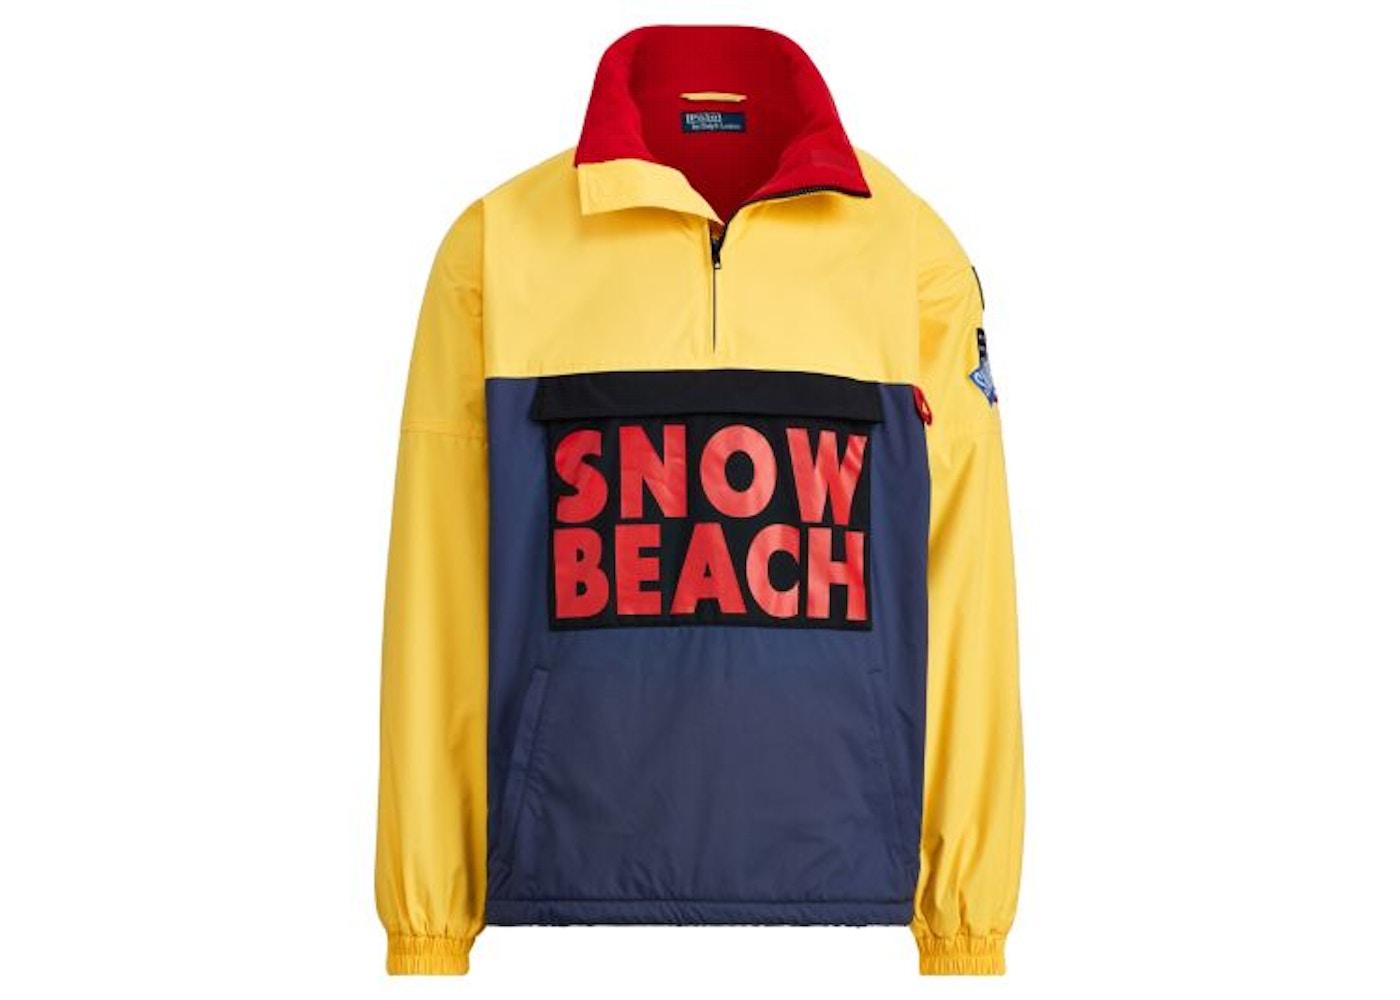 734c74a51793e Polo Ralph Lauren Snow Beach Pullover Deep Water Chrome Yellow - FW17